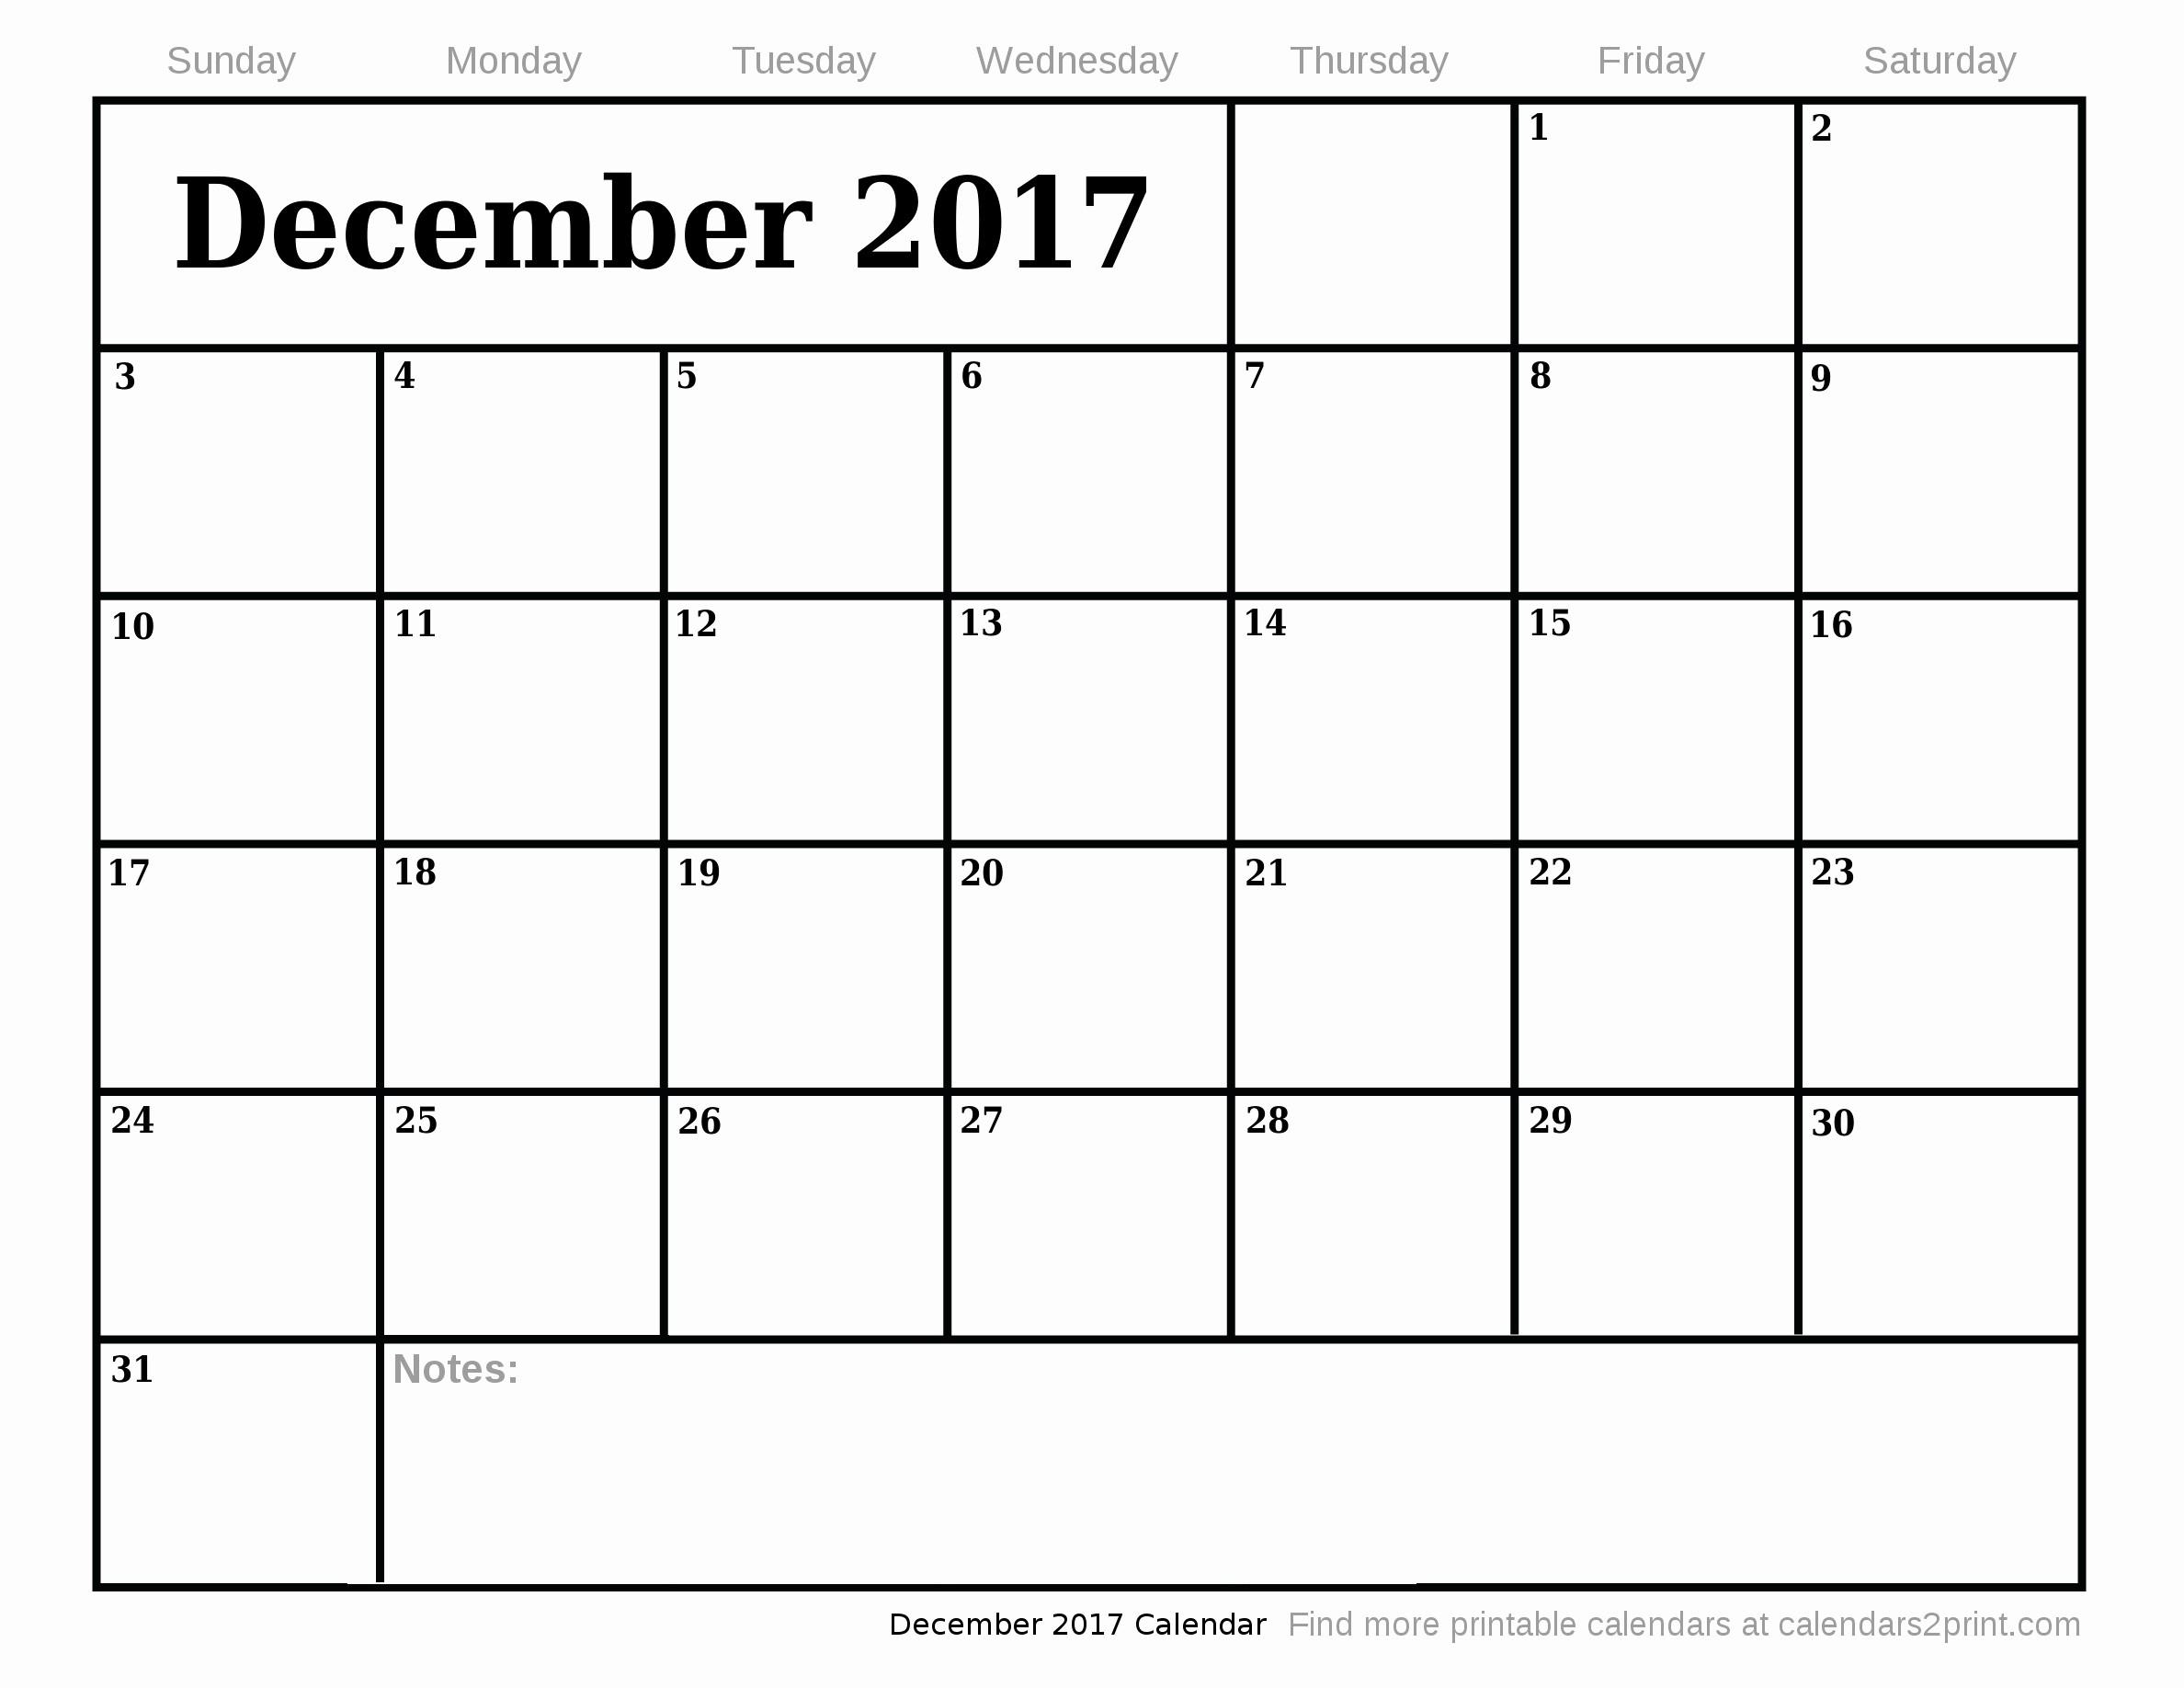 Free Blank Printable Calendar 2017 Luxury December 2017 Printable Calendar